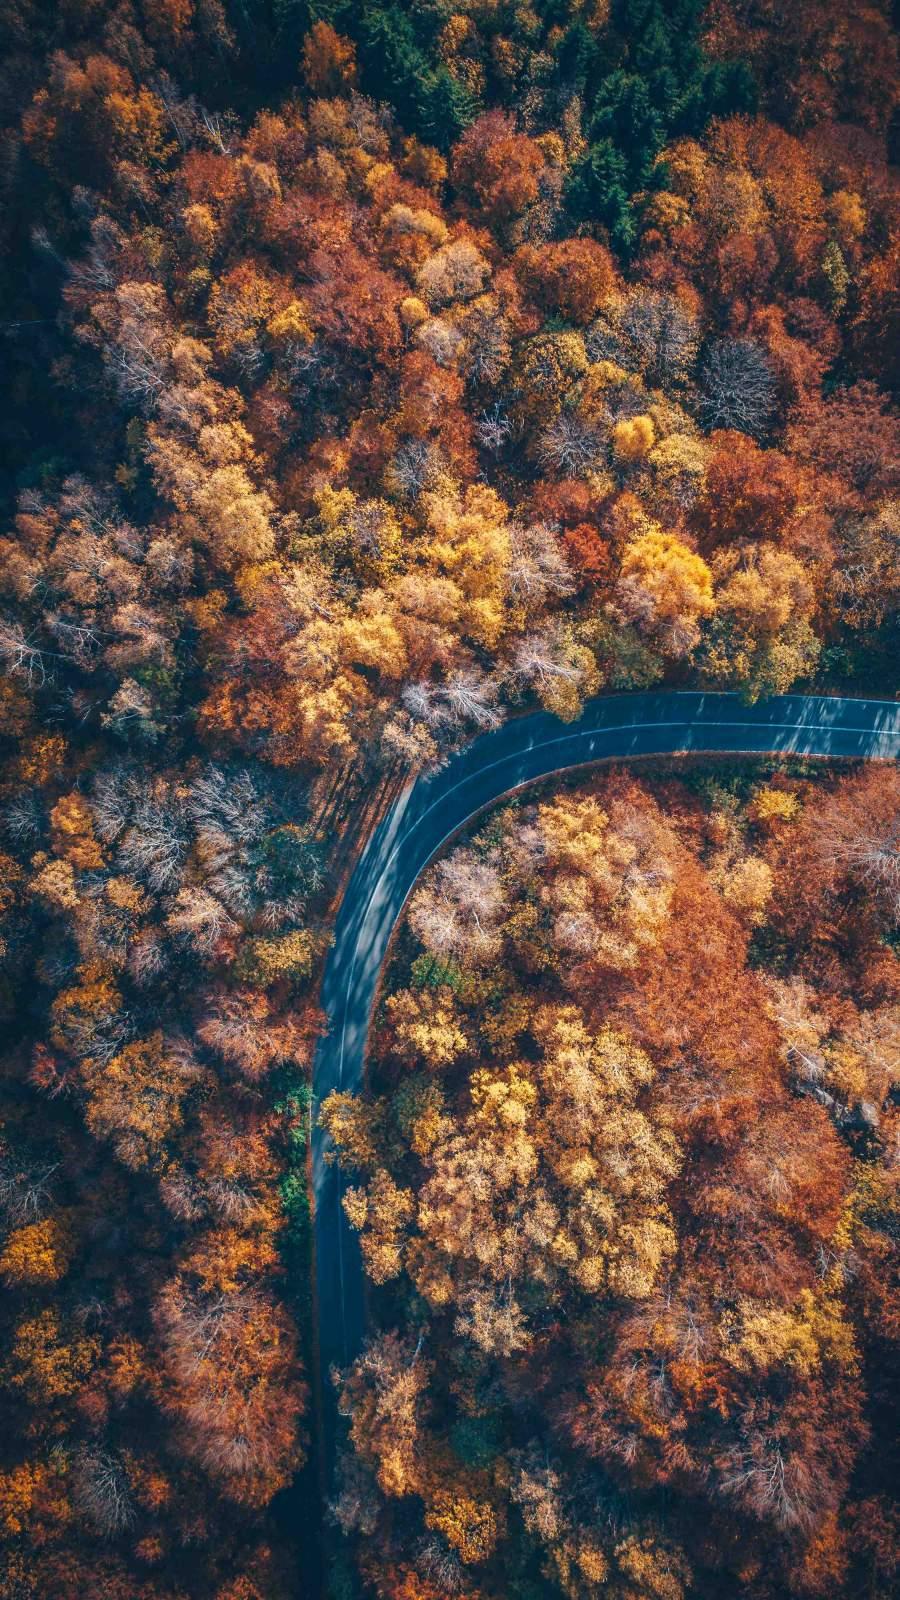 Autumn Nature Road Aerial View iPhone Wallpaper